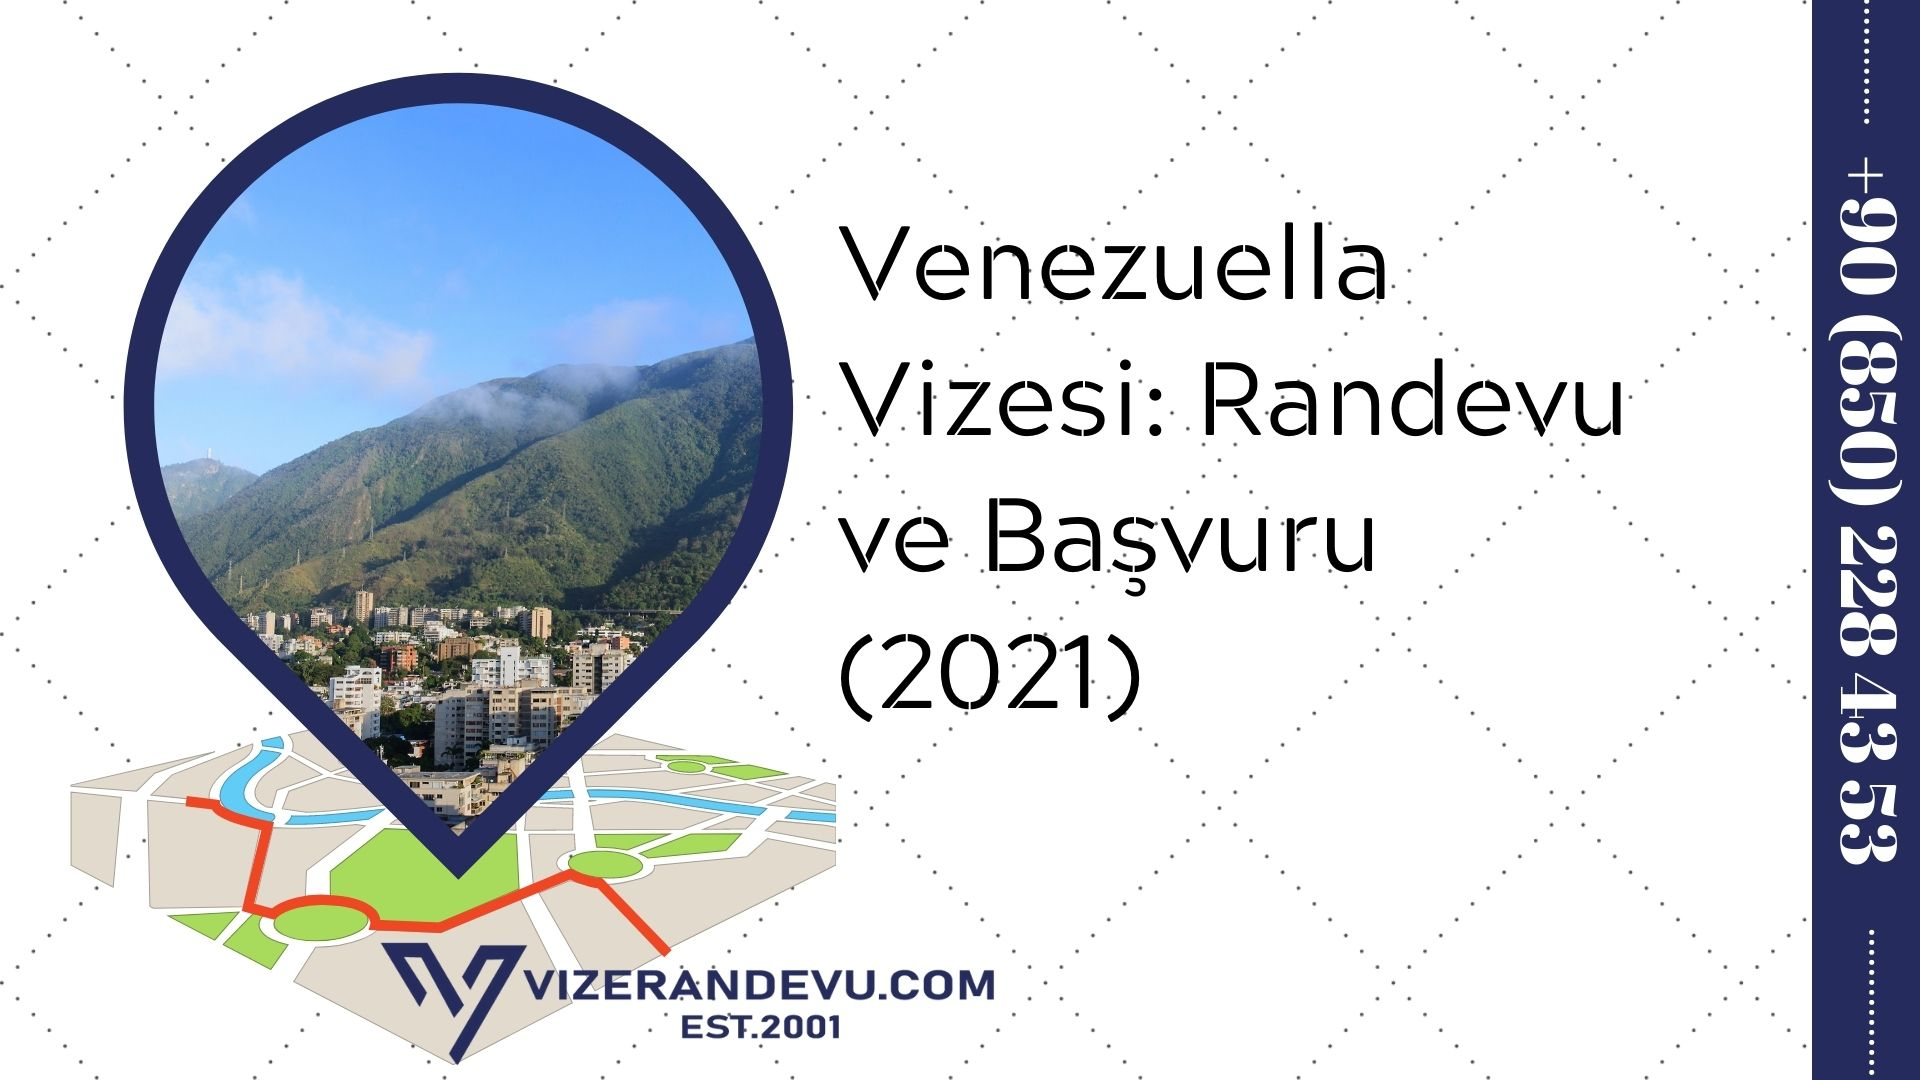 Venezuella Vizesi: Randevu ve Başvuru (2021)